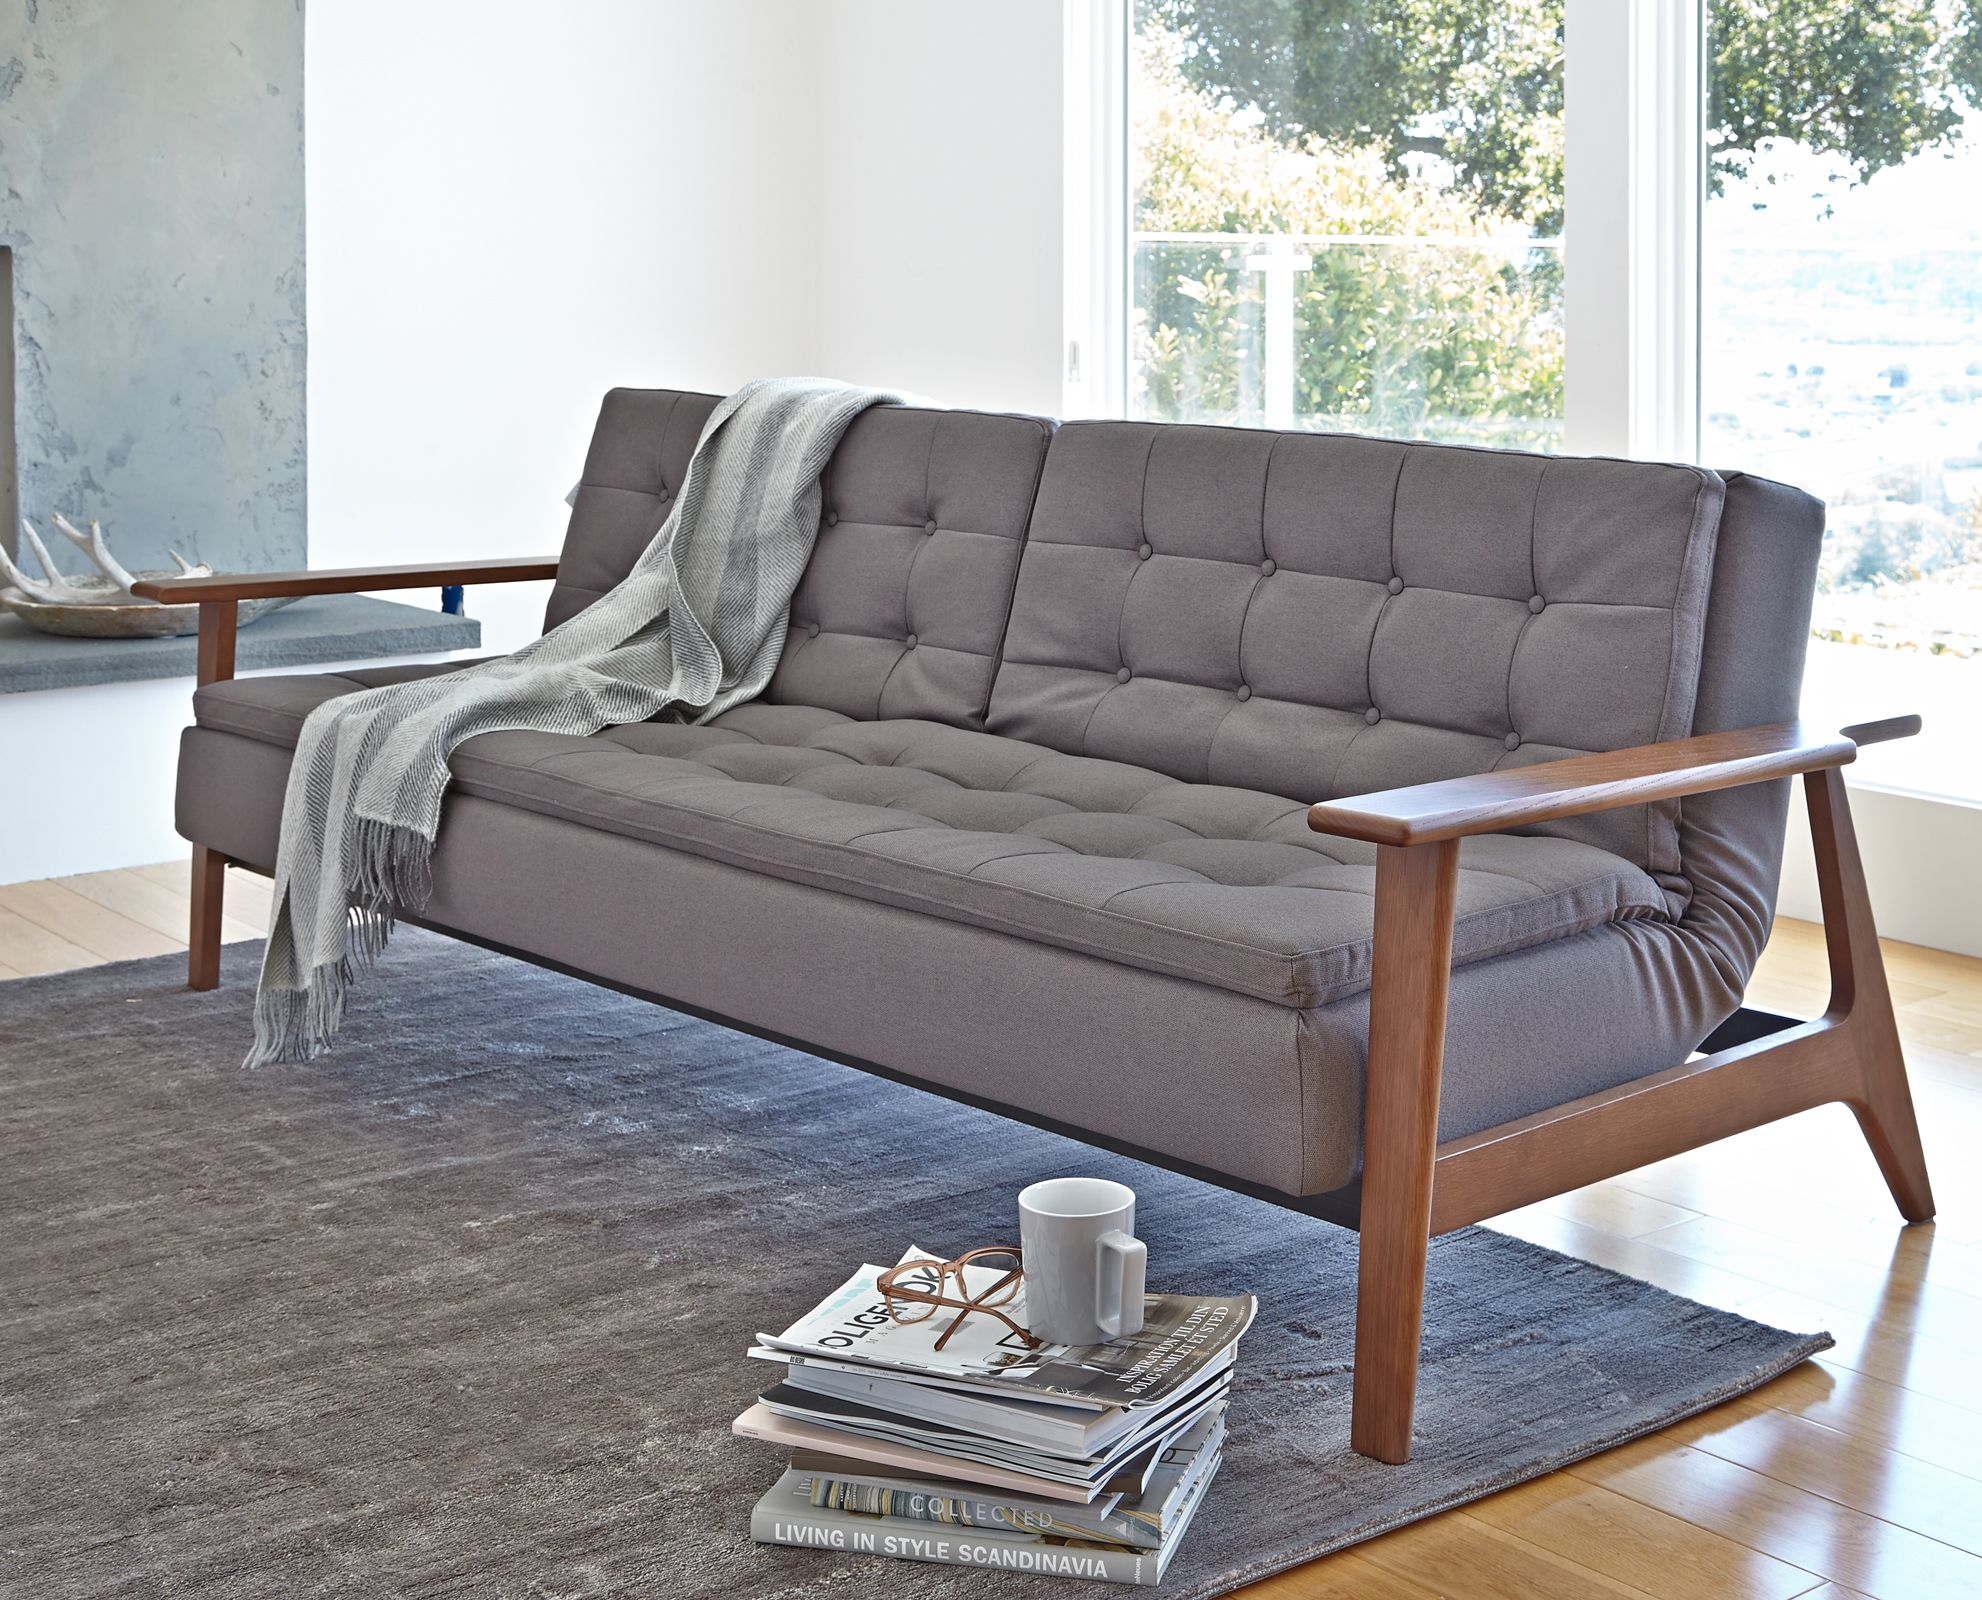 Scandinavian Design Sofa Singapore Abbyson Living Levari Reclining Leather And Loveseat Tellima Convertible Sleeper Sofas Pinterest